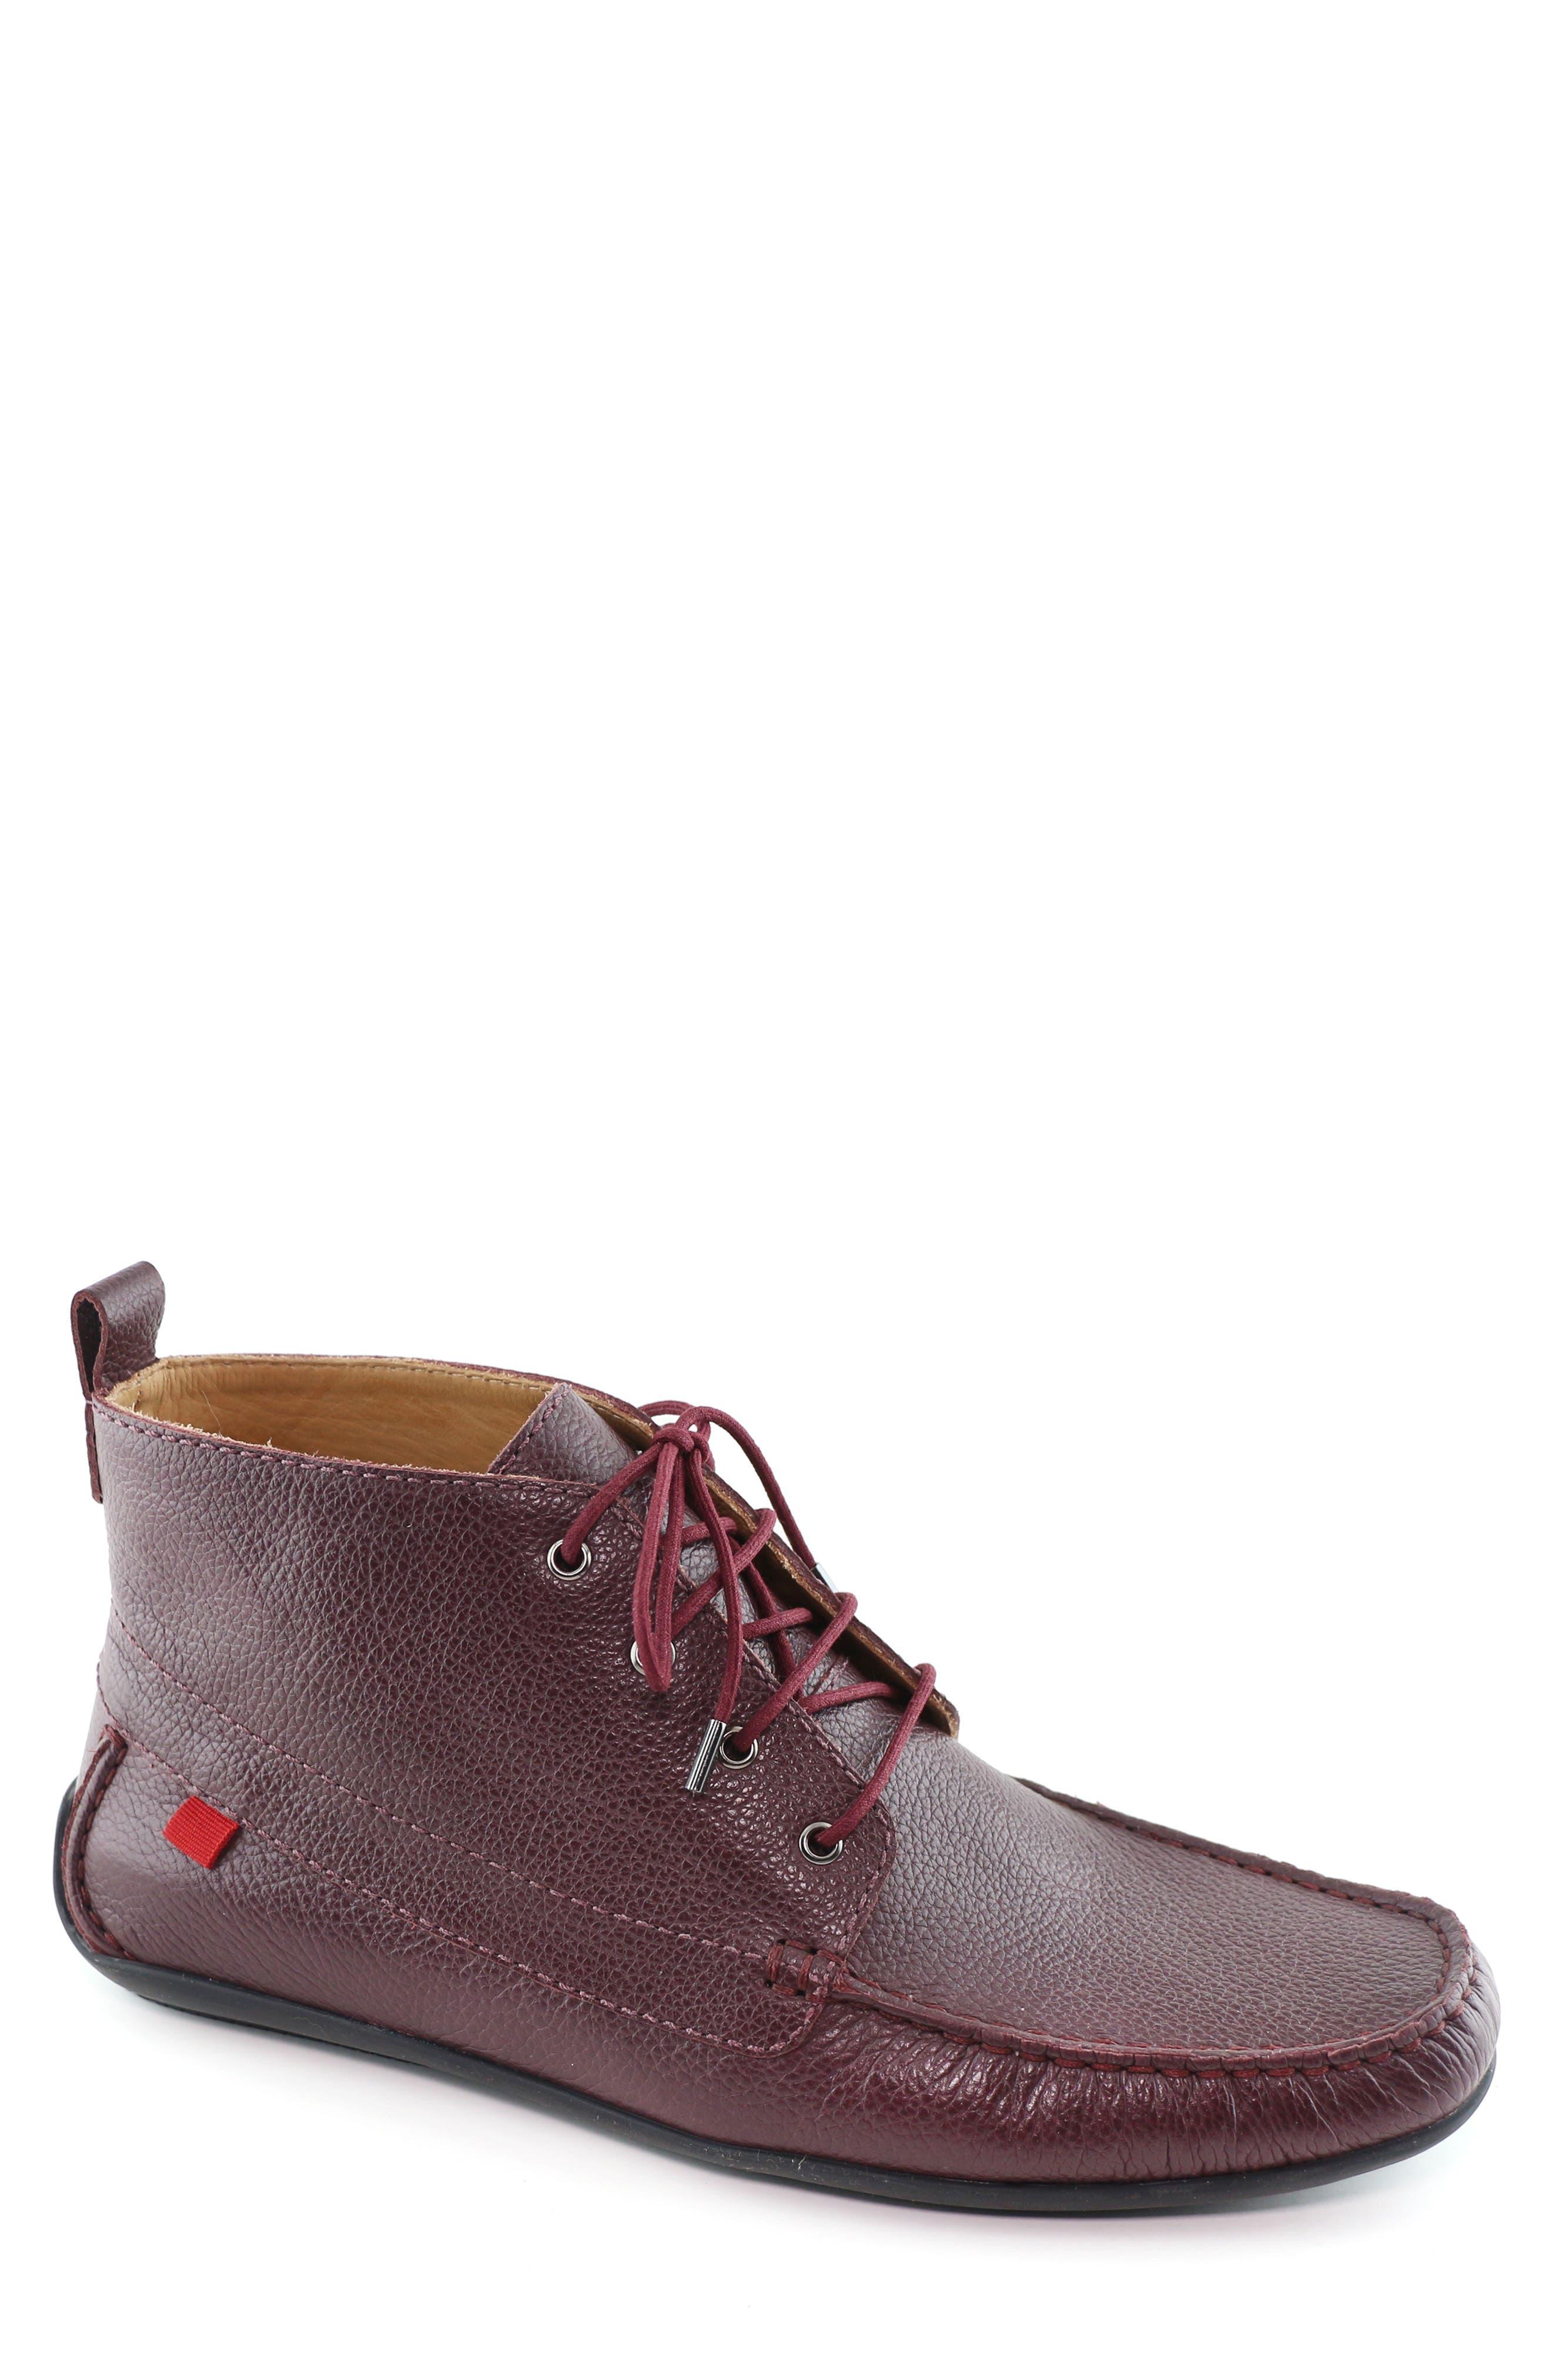 Soho Boot 2 Chukka Boot, Main, color, WINE LEATHER